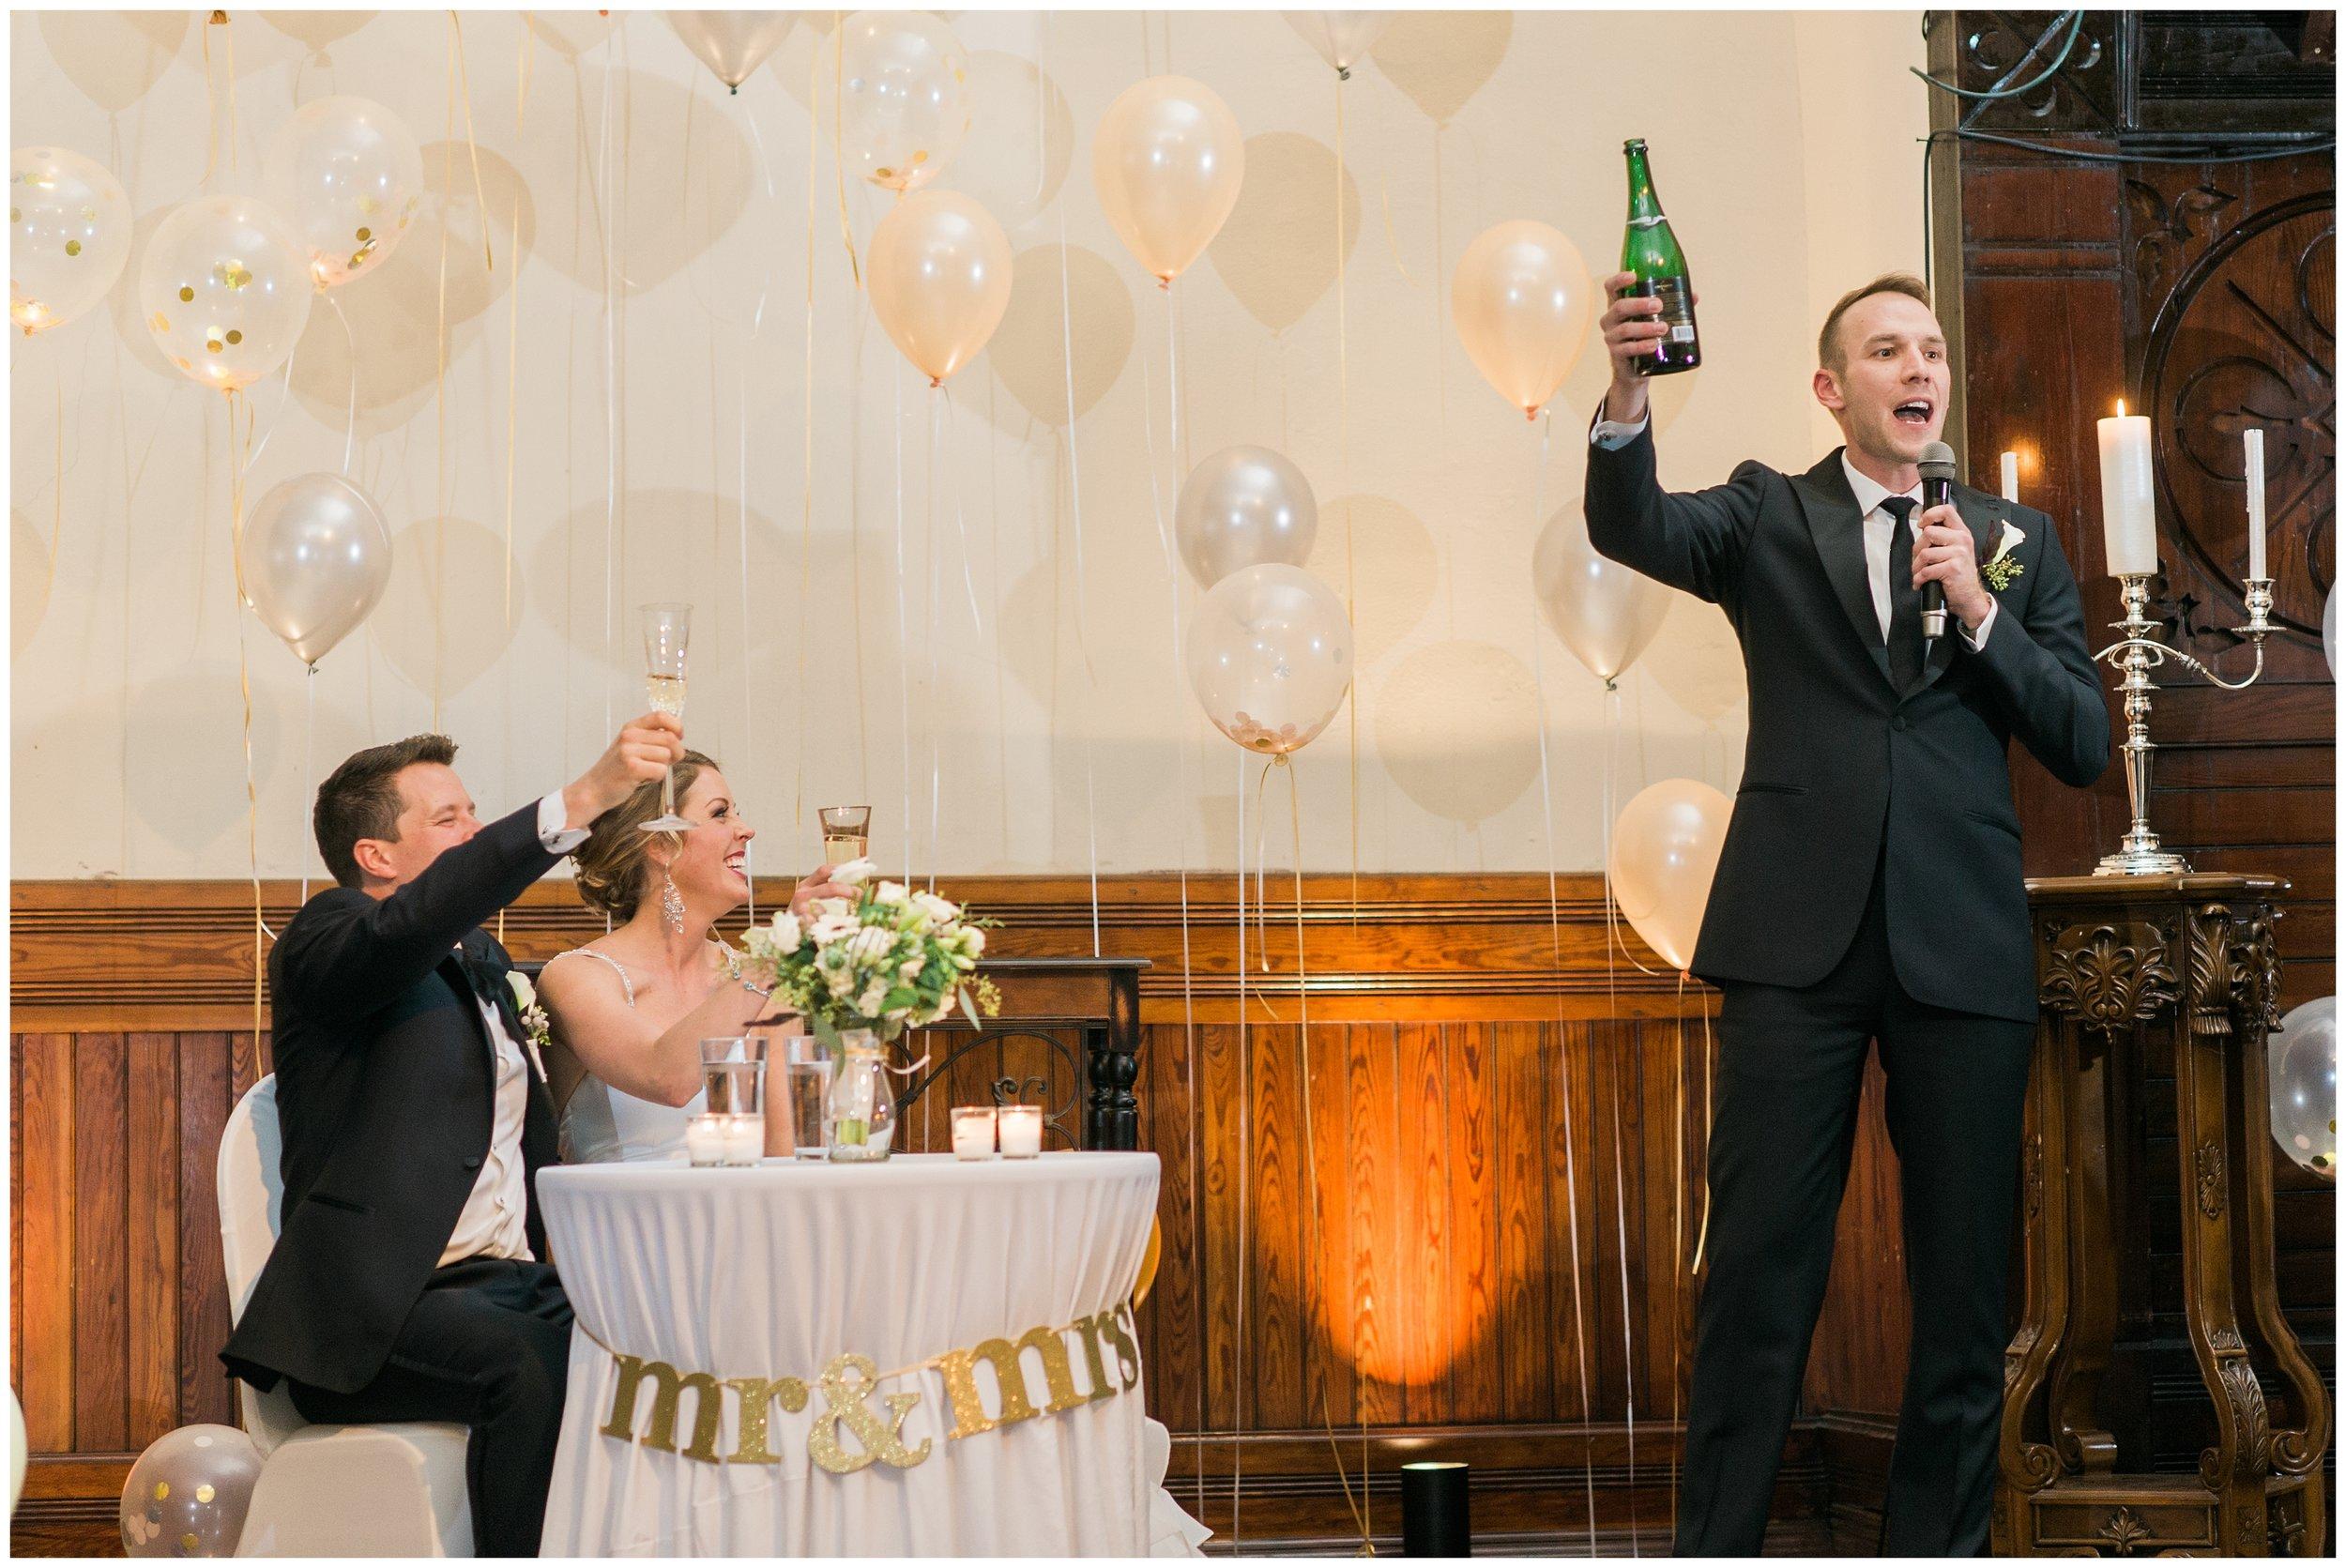 Rebecca_Bridges_Photography_Indianapolis_Wedding_Photographer_5847.jpg